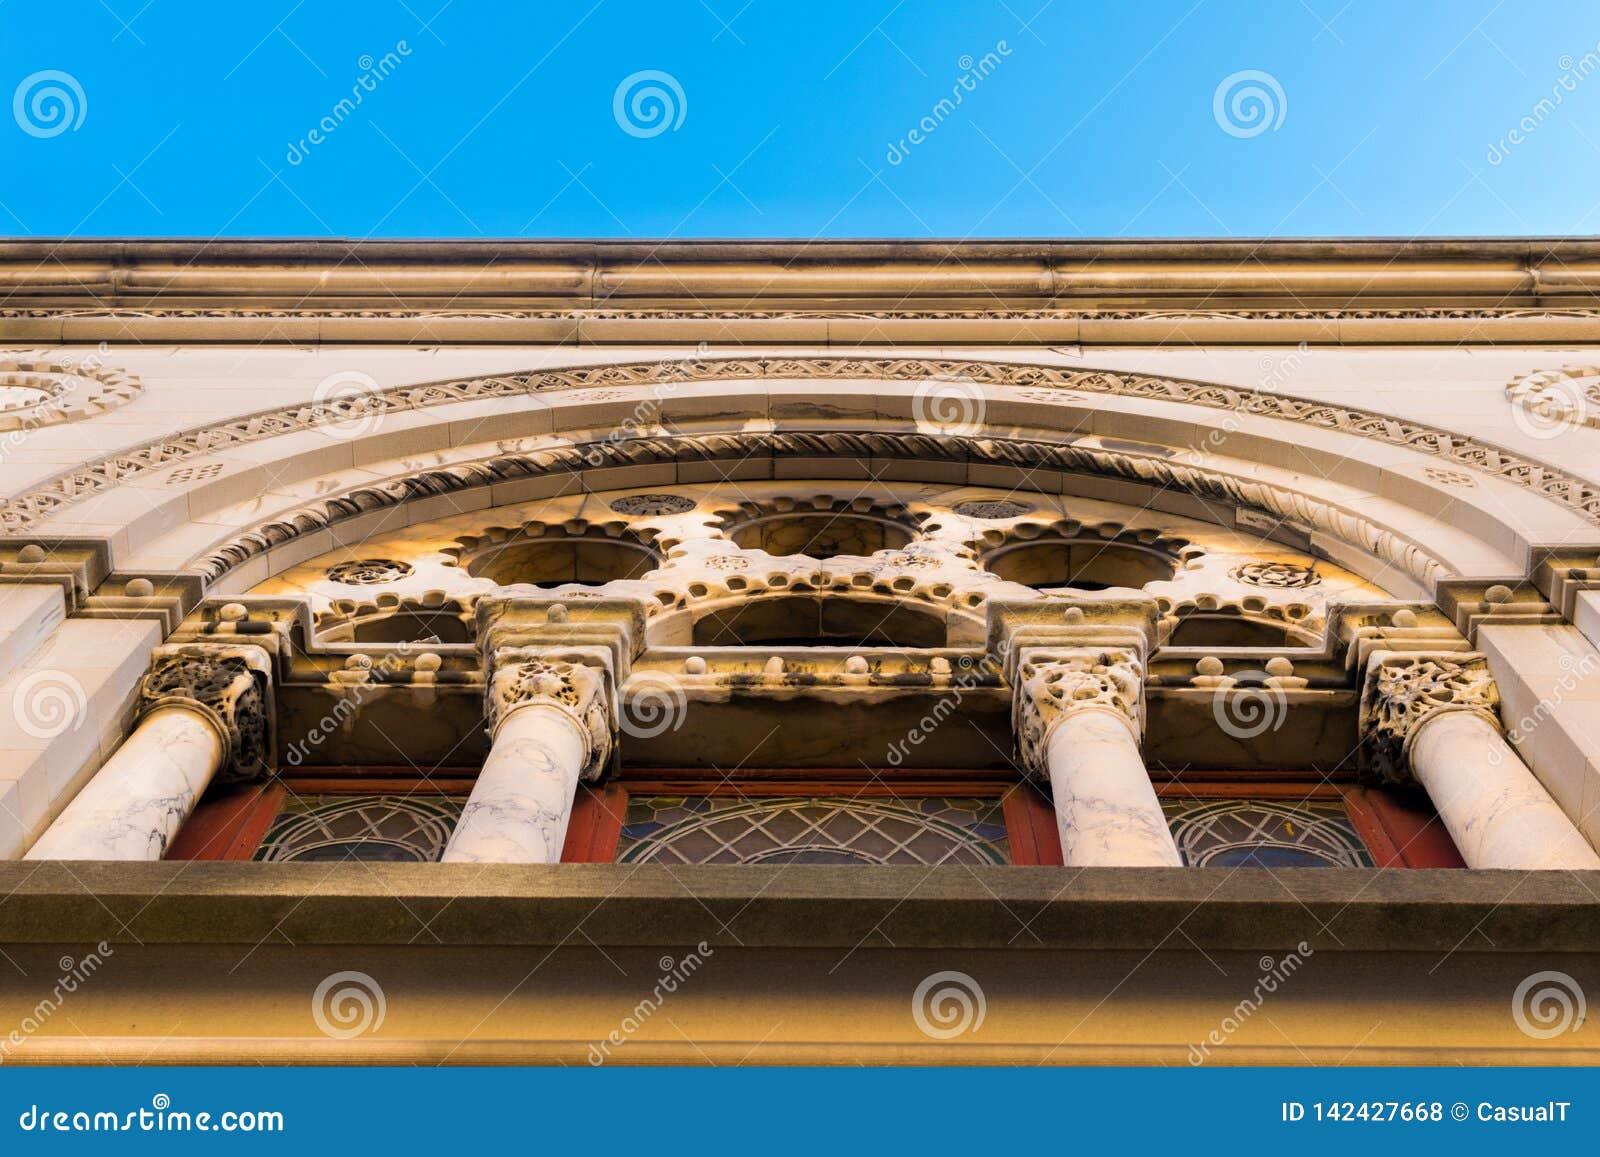 Arquitectura imaginaria en el exterior de una pequeña iglesia en Harlem, Manhattan, New York City, NY, los E.E.U.U.